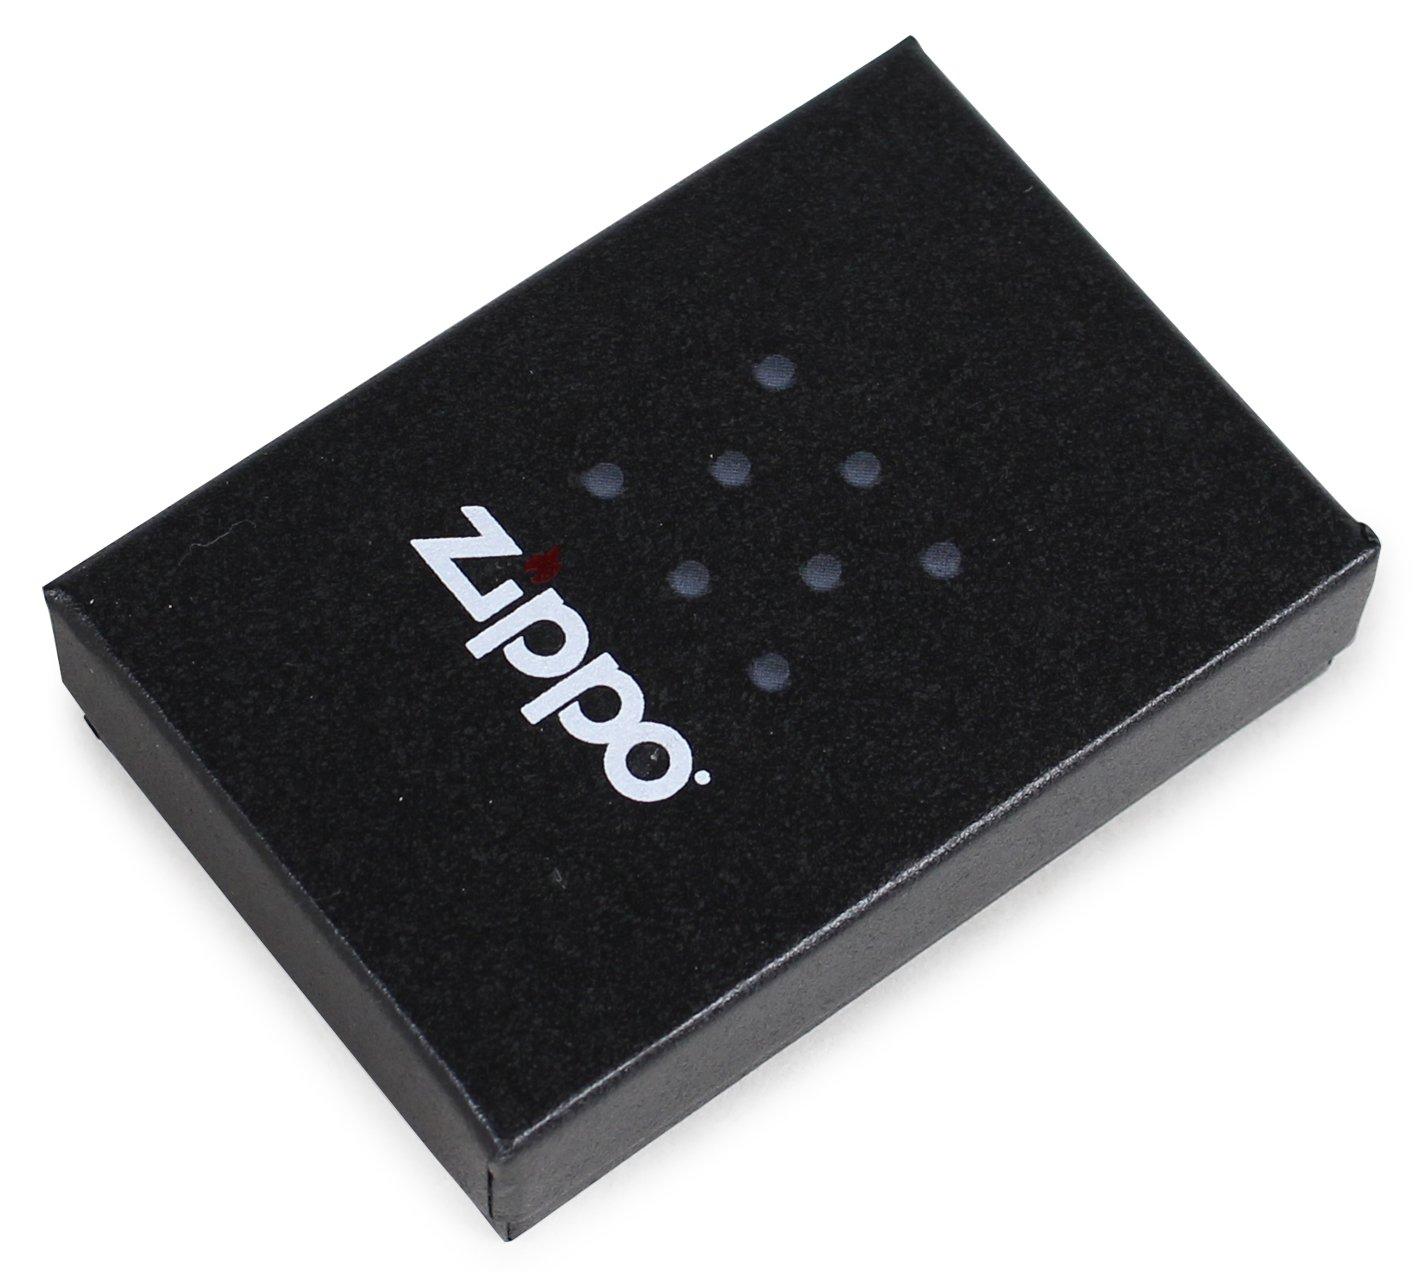 Zippo-2S-TLINEZ-3.jpg